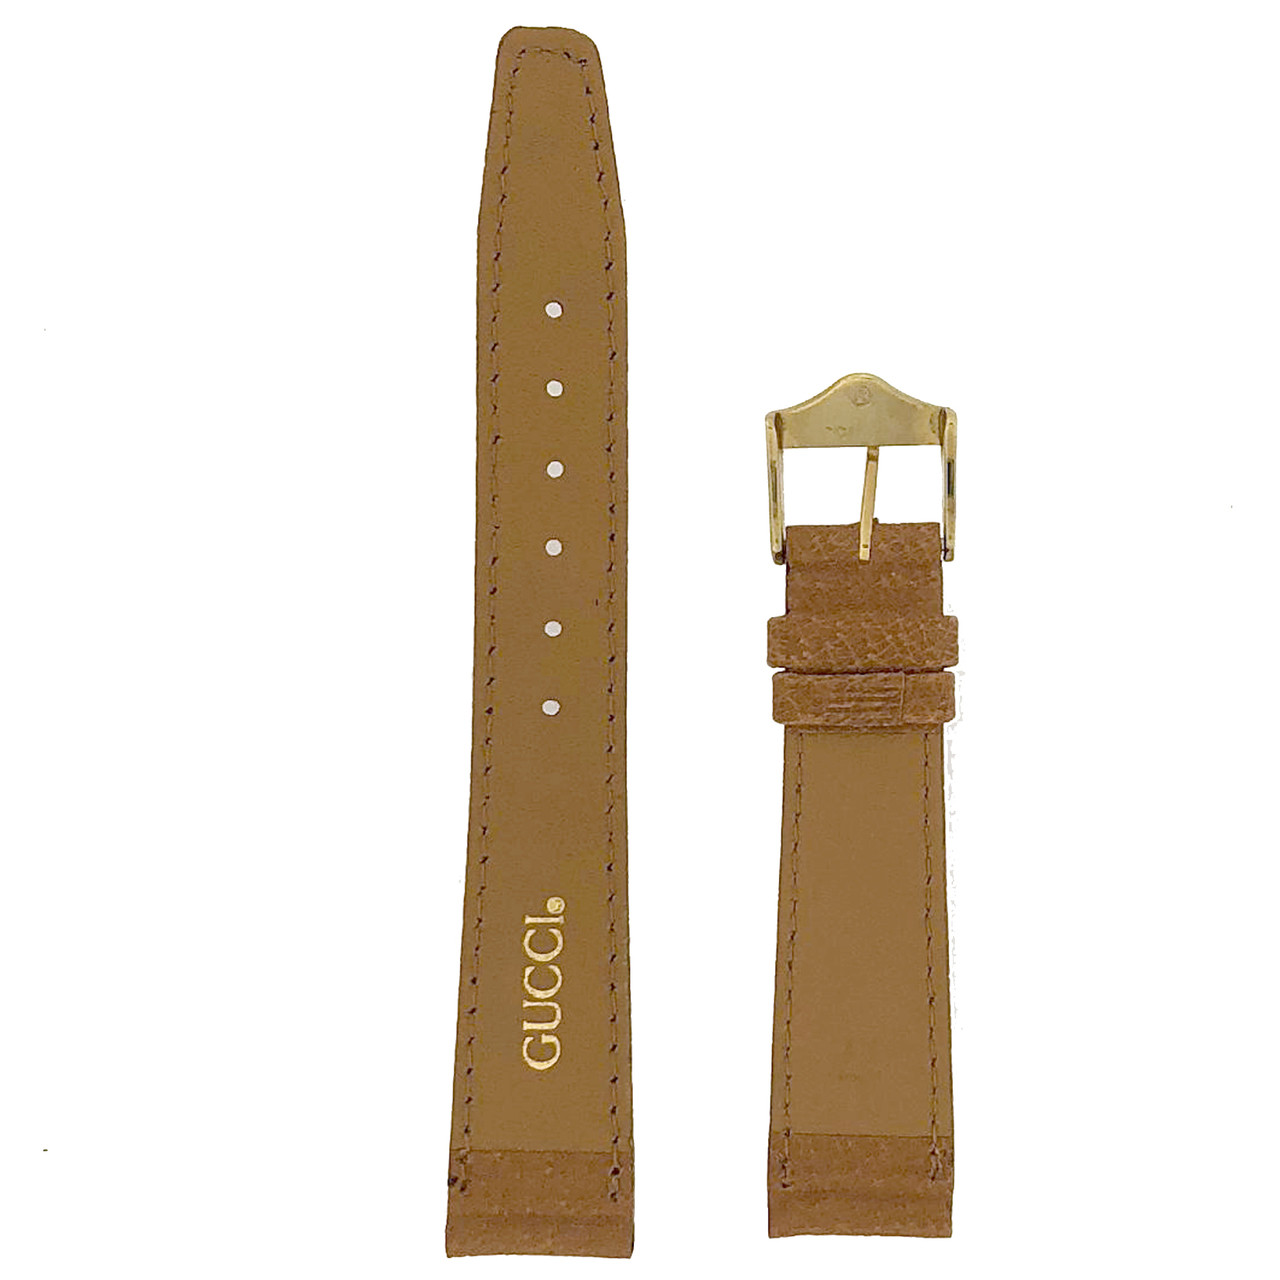 Gucci Watch Band 17mm Tan models 2600M 3000M 3800M 7600M 8000M